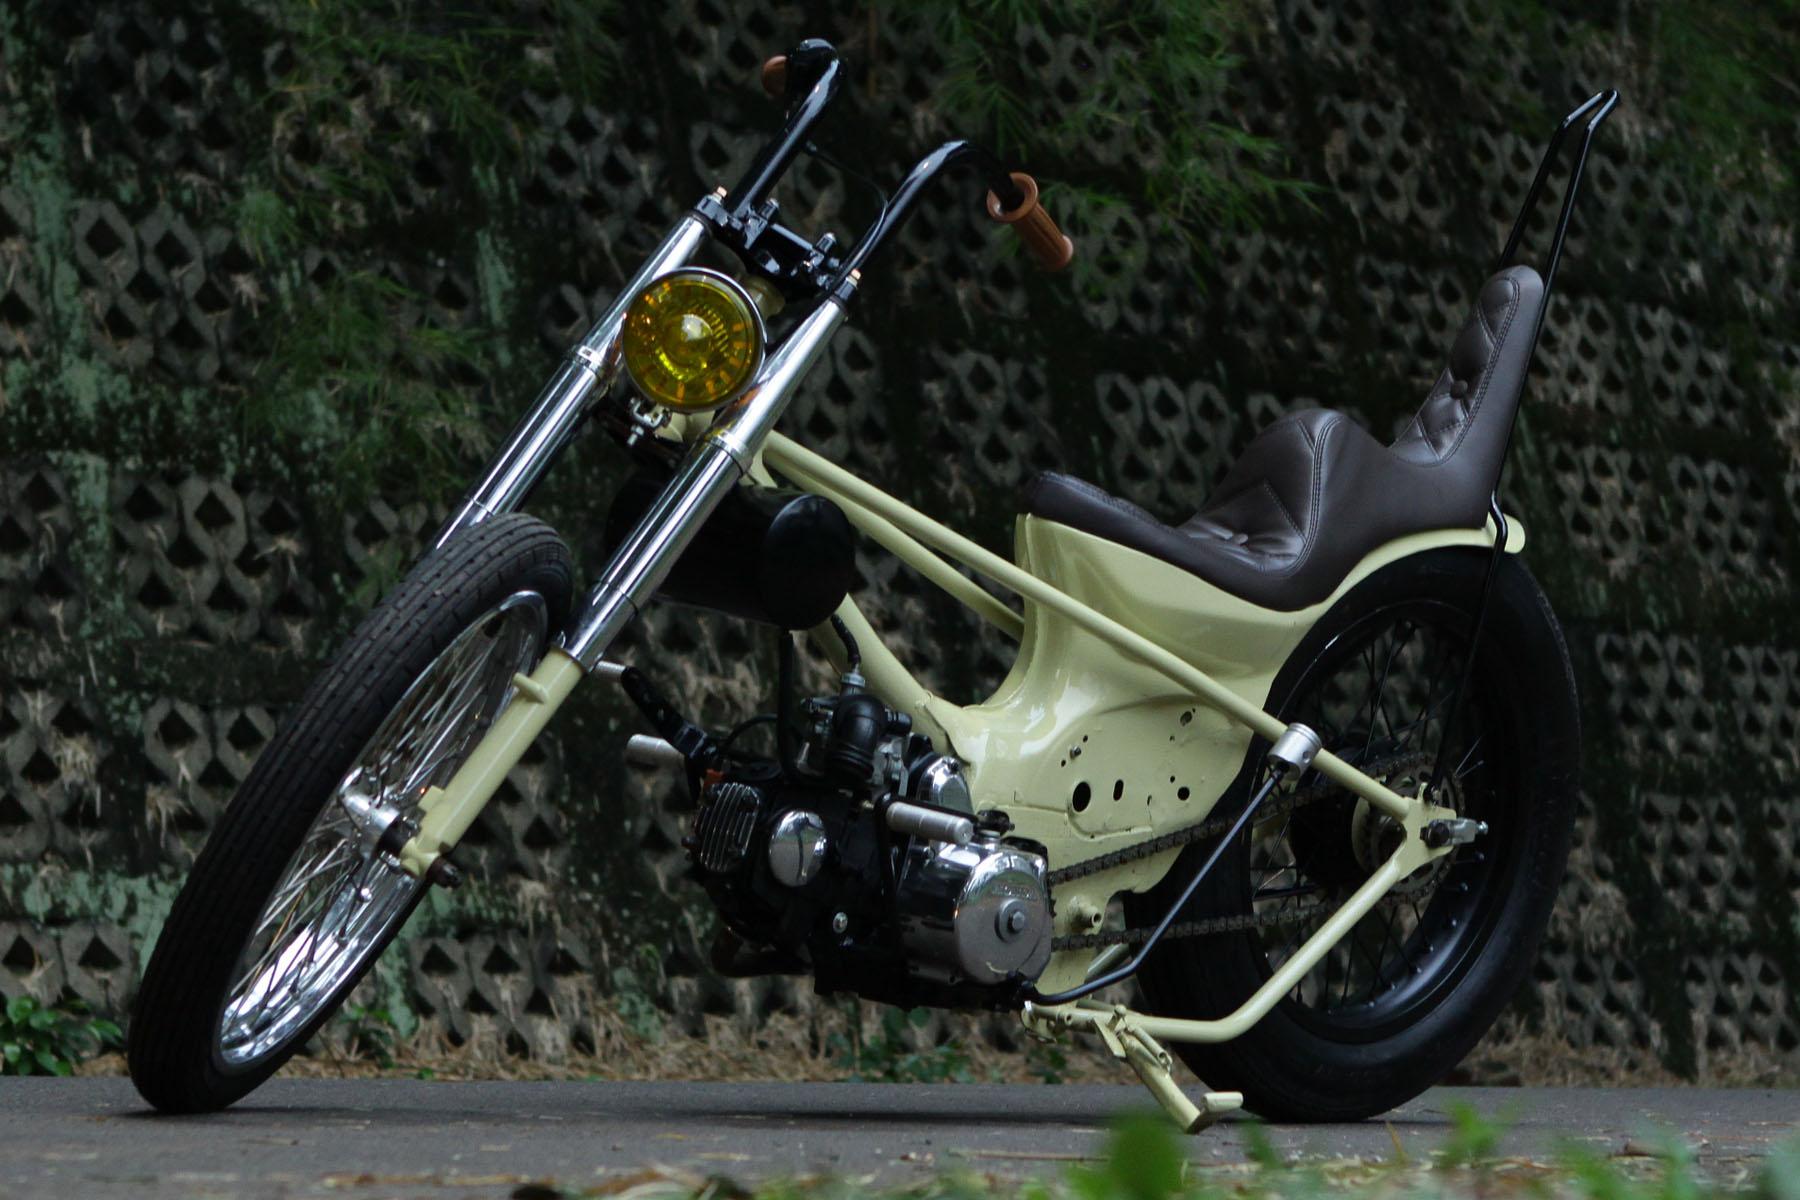 Modifikasi Honda Astrea Grand Ganti Identitas Gilamotor